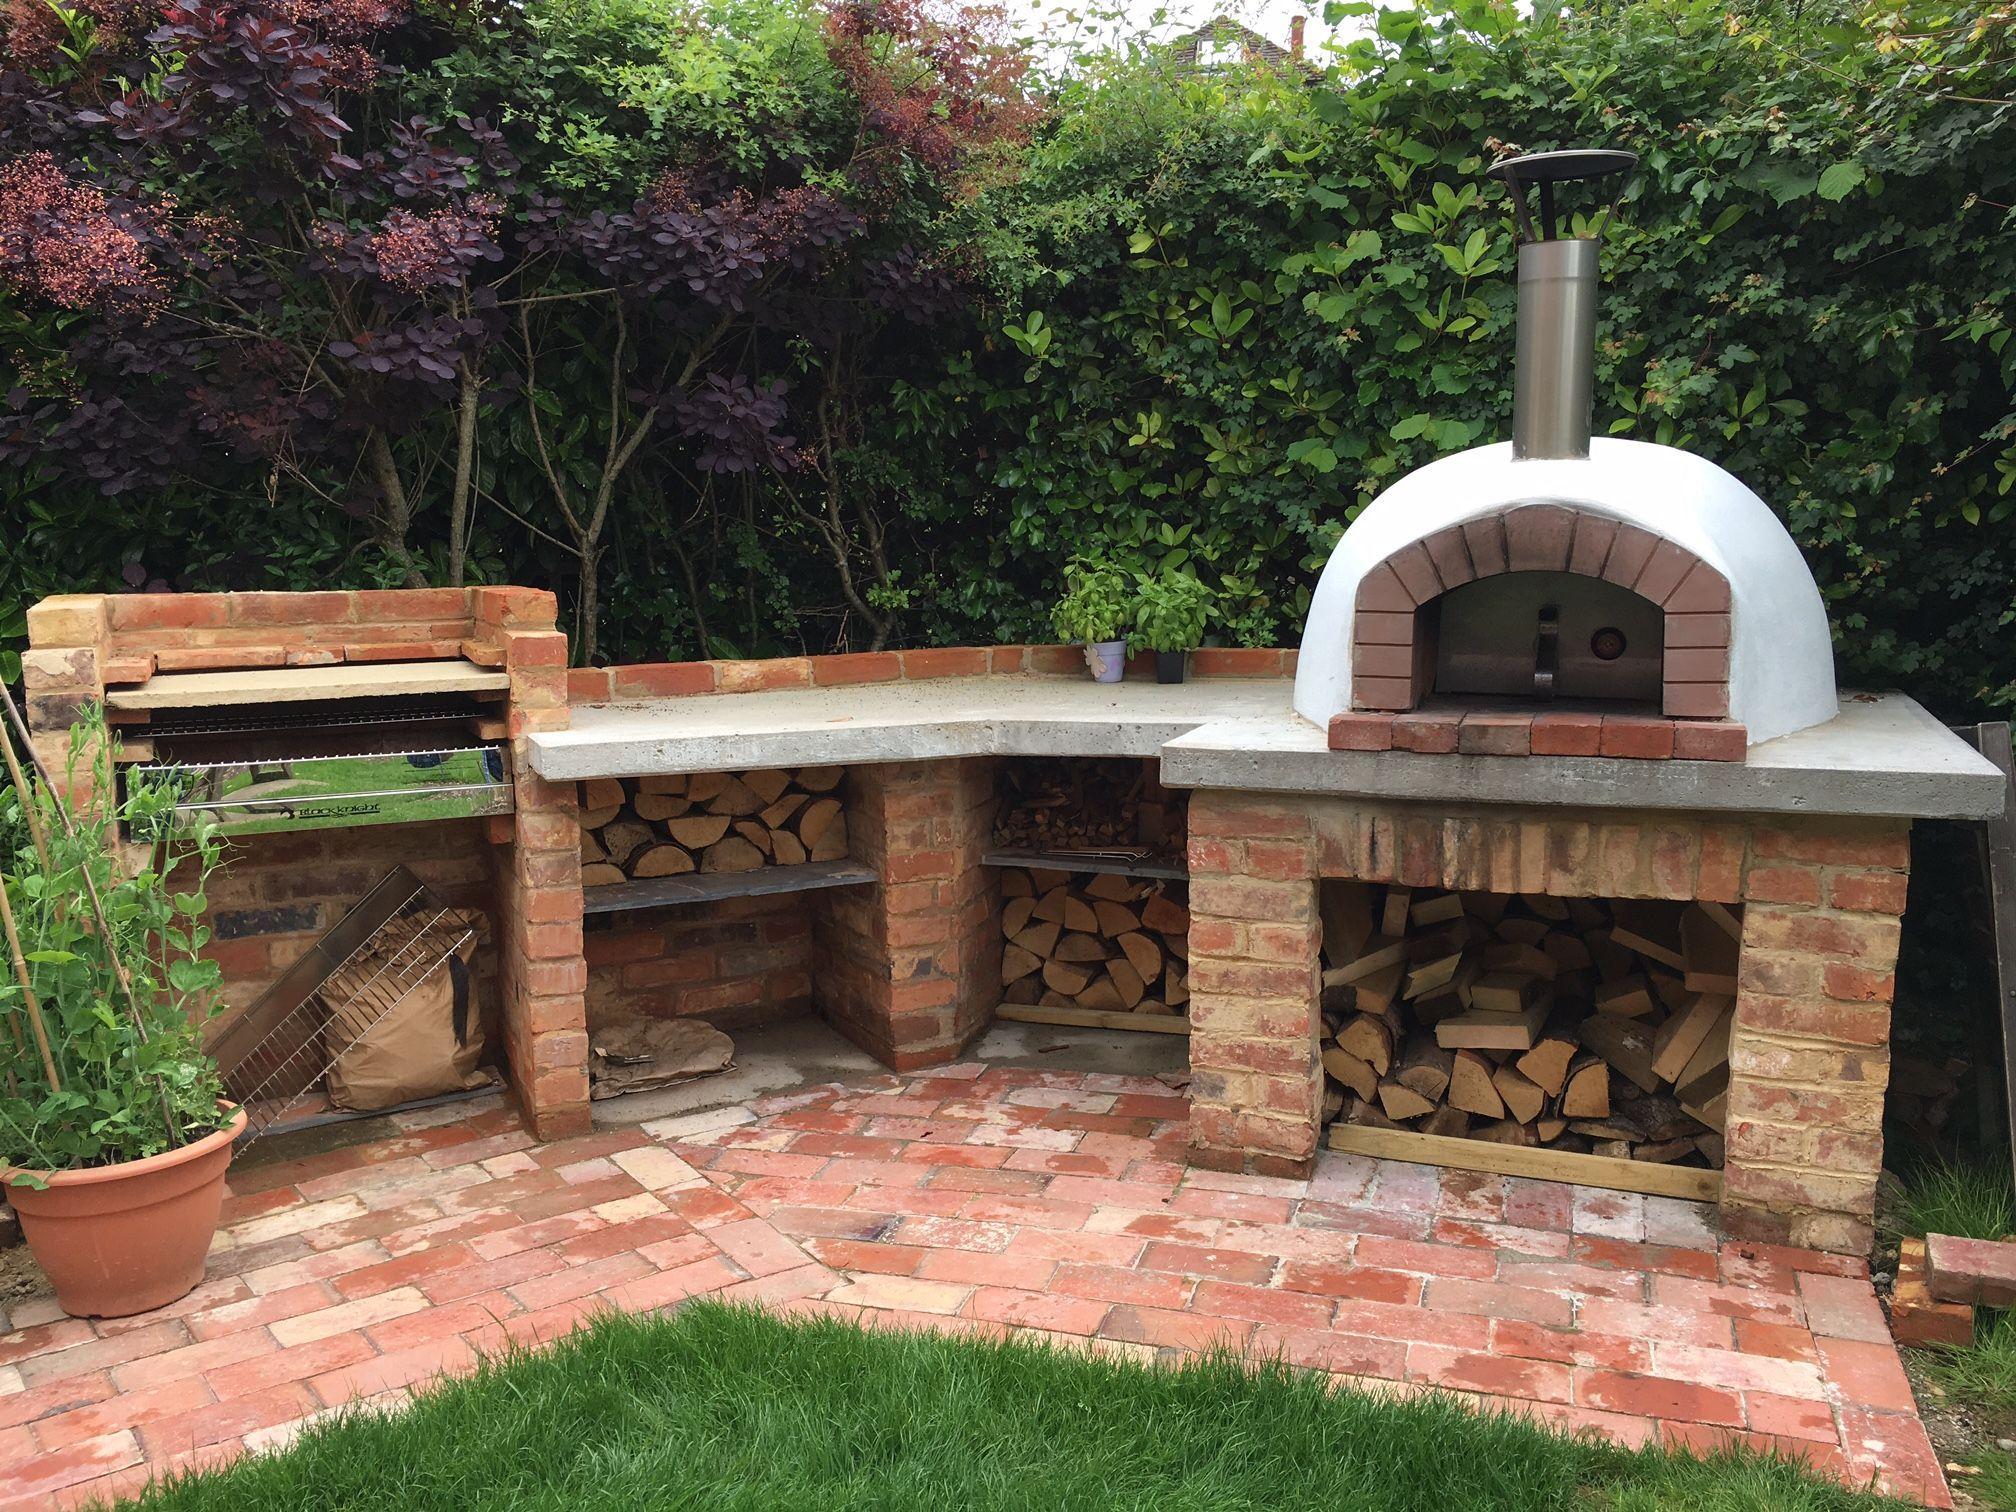 Www Thestonebakeo Bake Company Oven Stone Testimonials In 2020 Pizza Oven Outdoor Kitchen Outdoor Kitchen Outdoor Kitchen Design